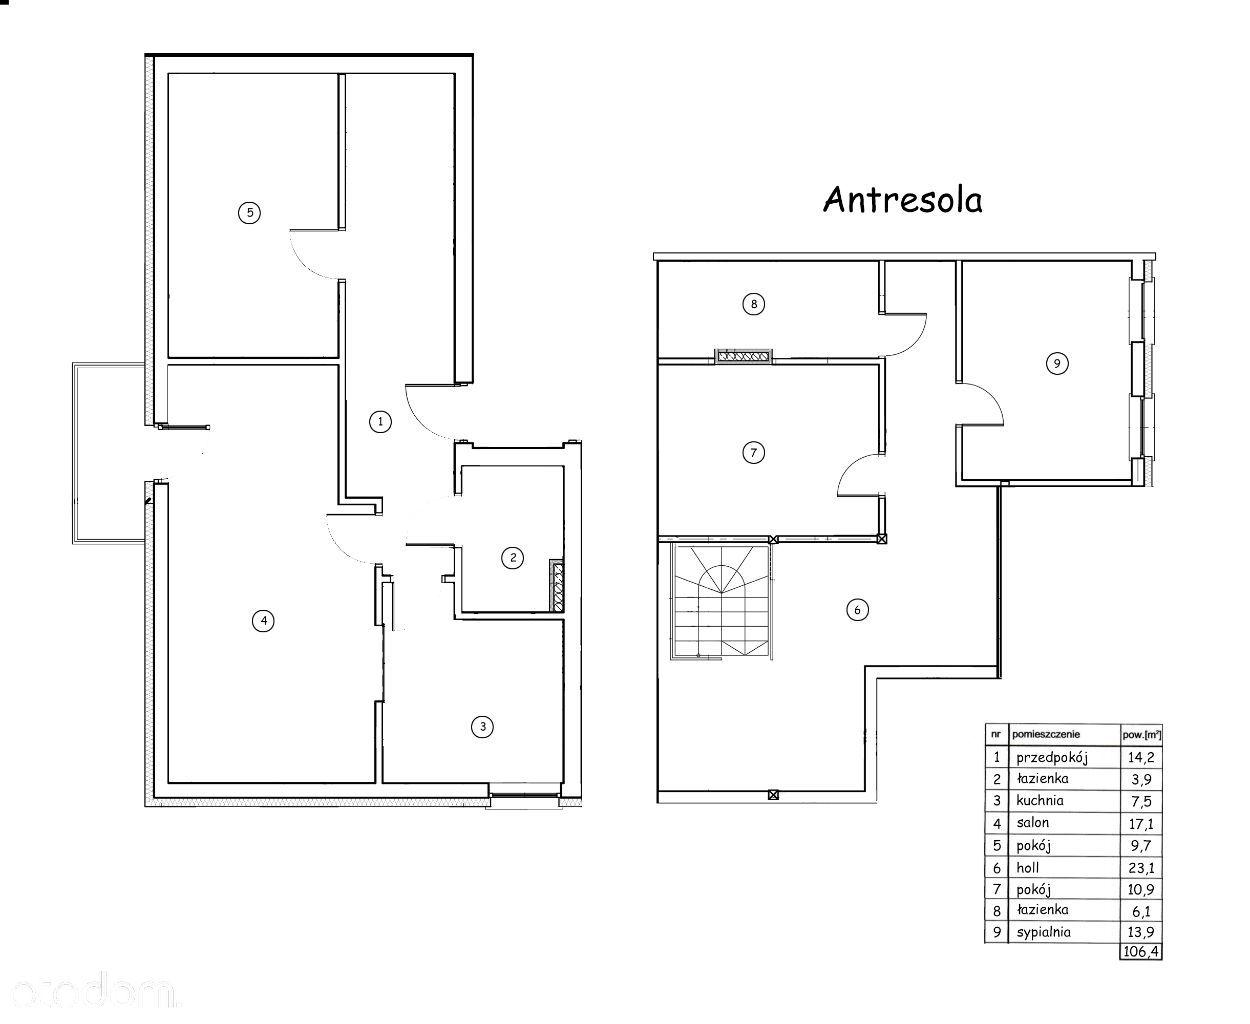 Apartament Bielańska 8a/balkon/podłogówka/winda